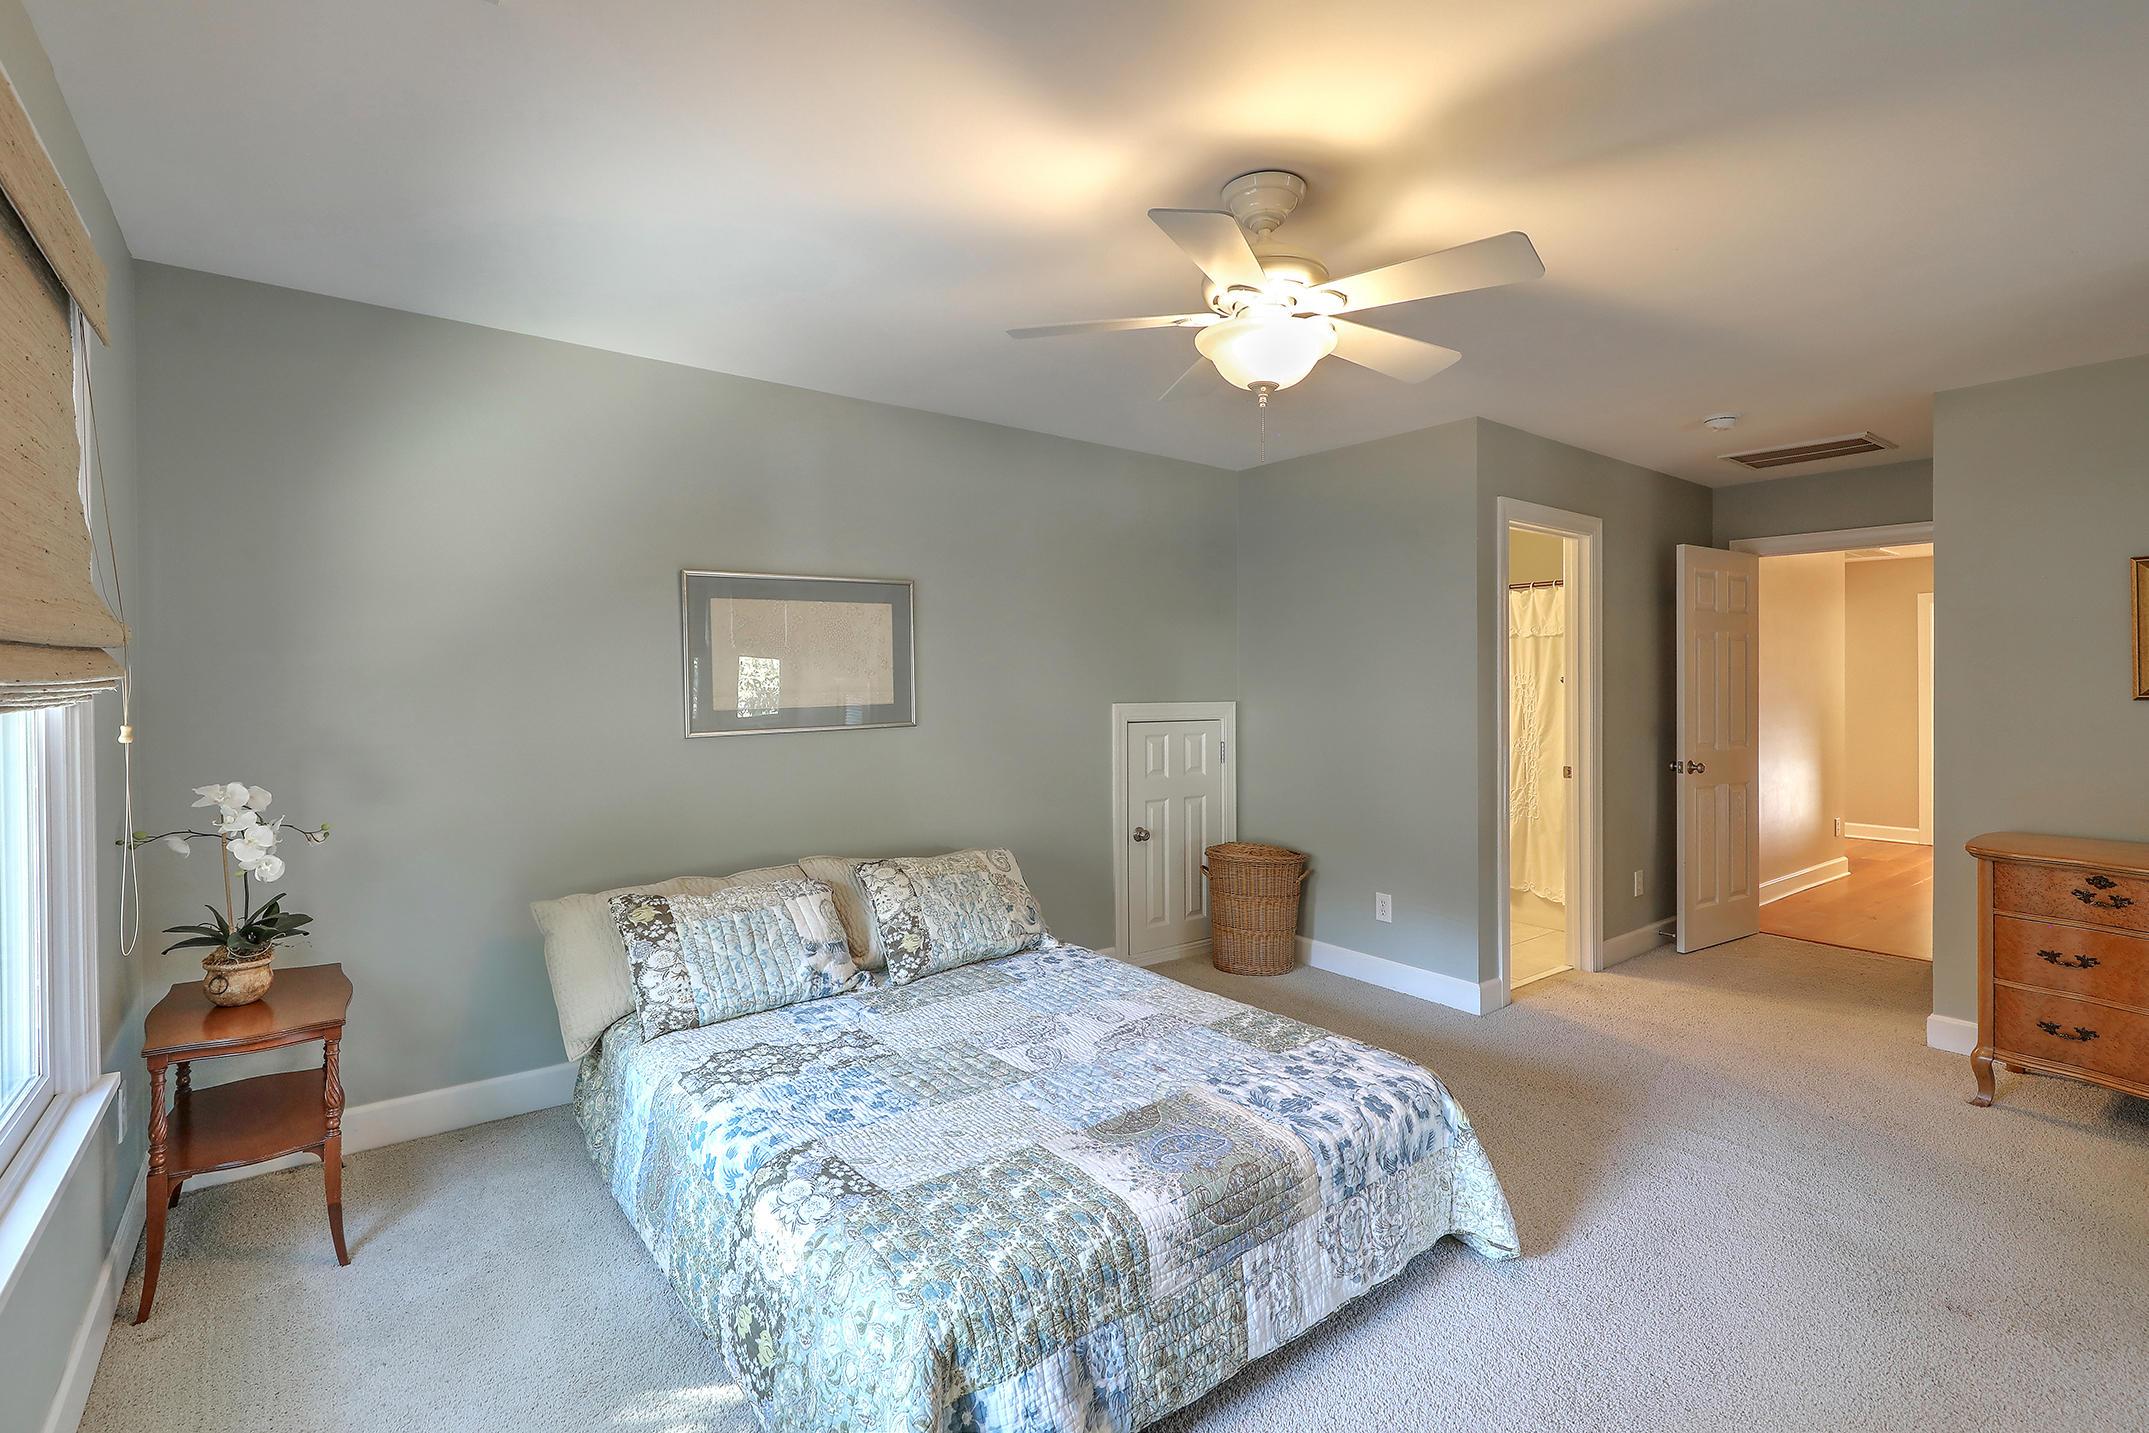 Hamlin Plantation Homes For Sale - 1204 Leaning Oaks, Mount Pleasant, SC - 55